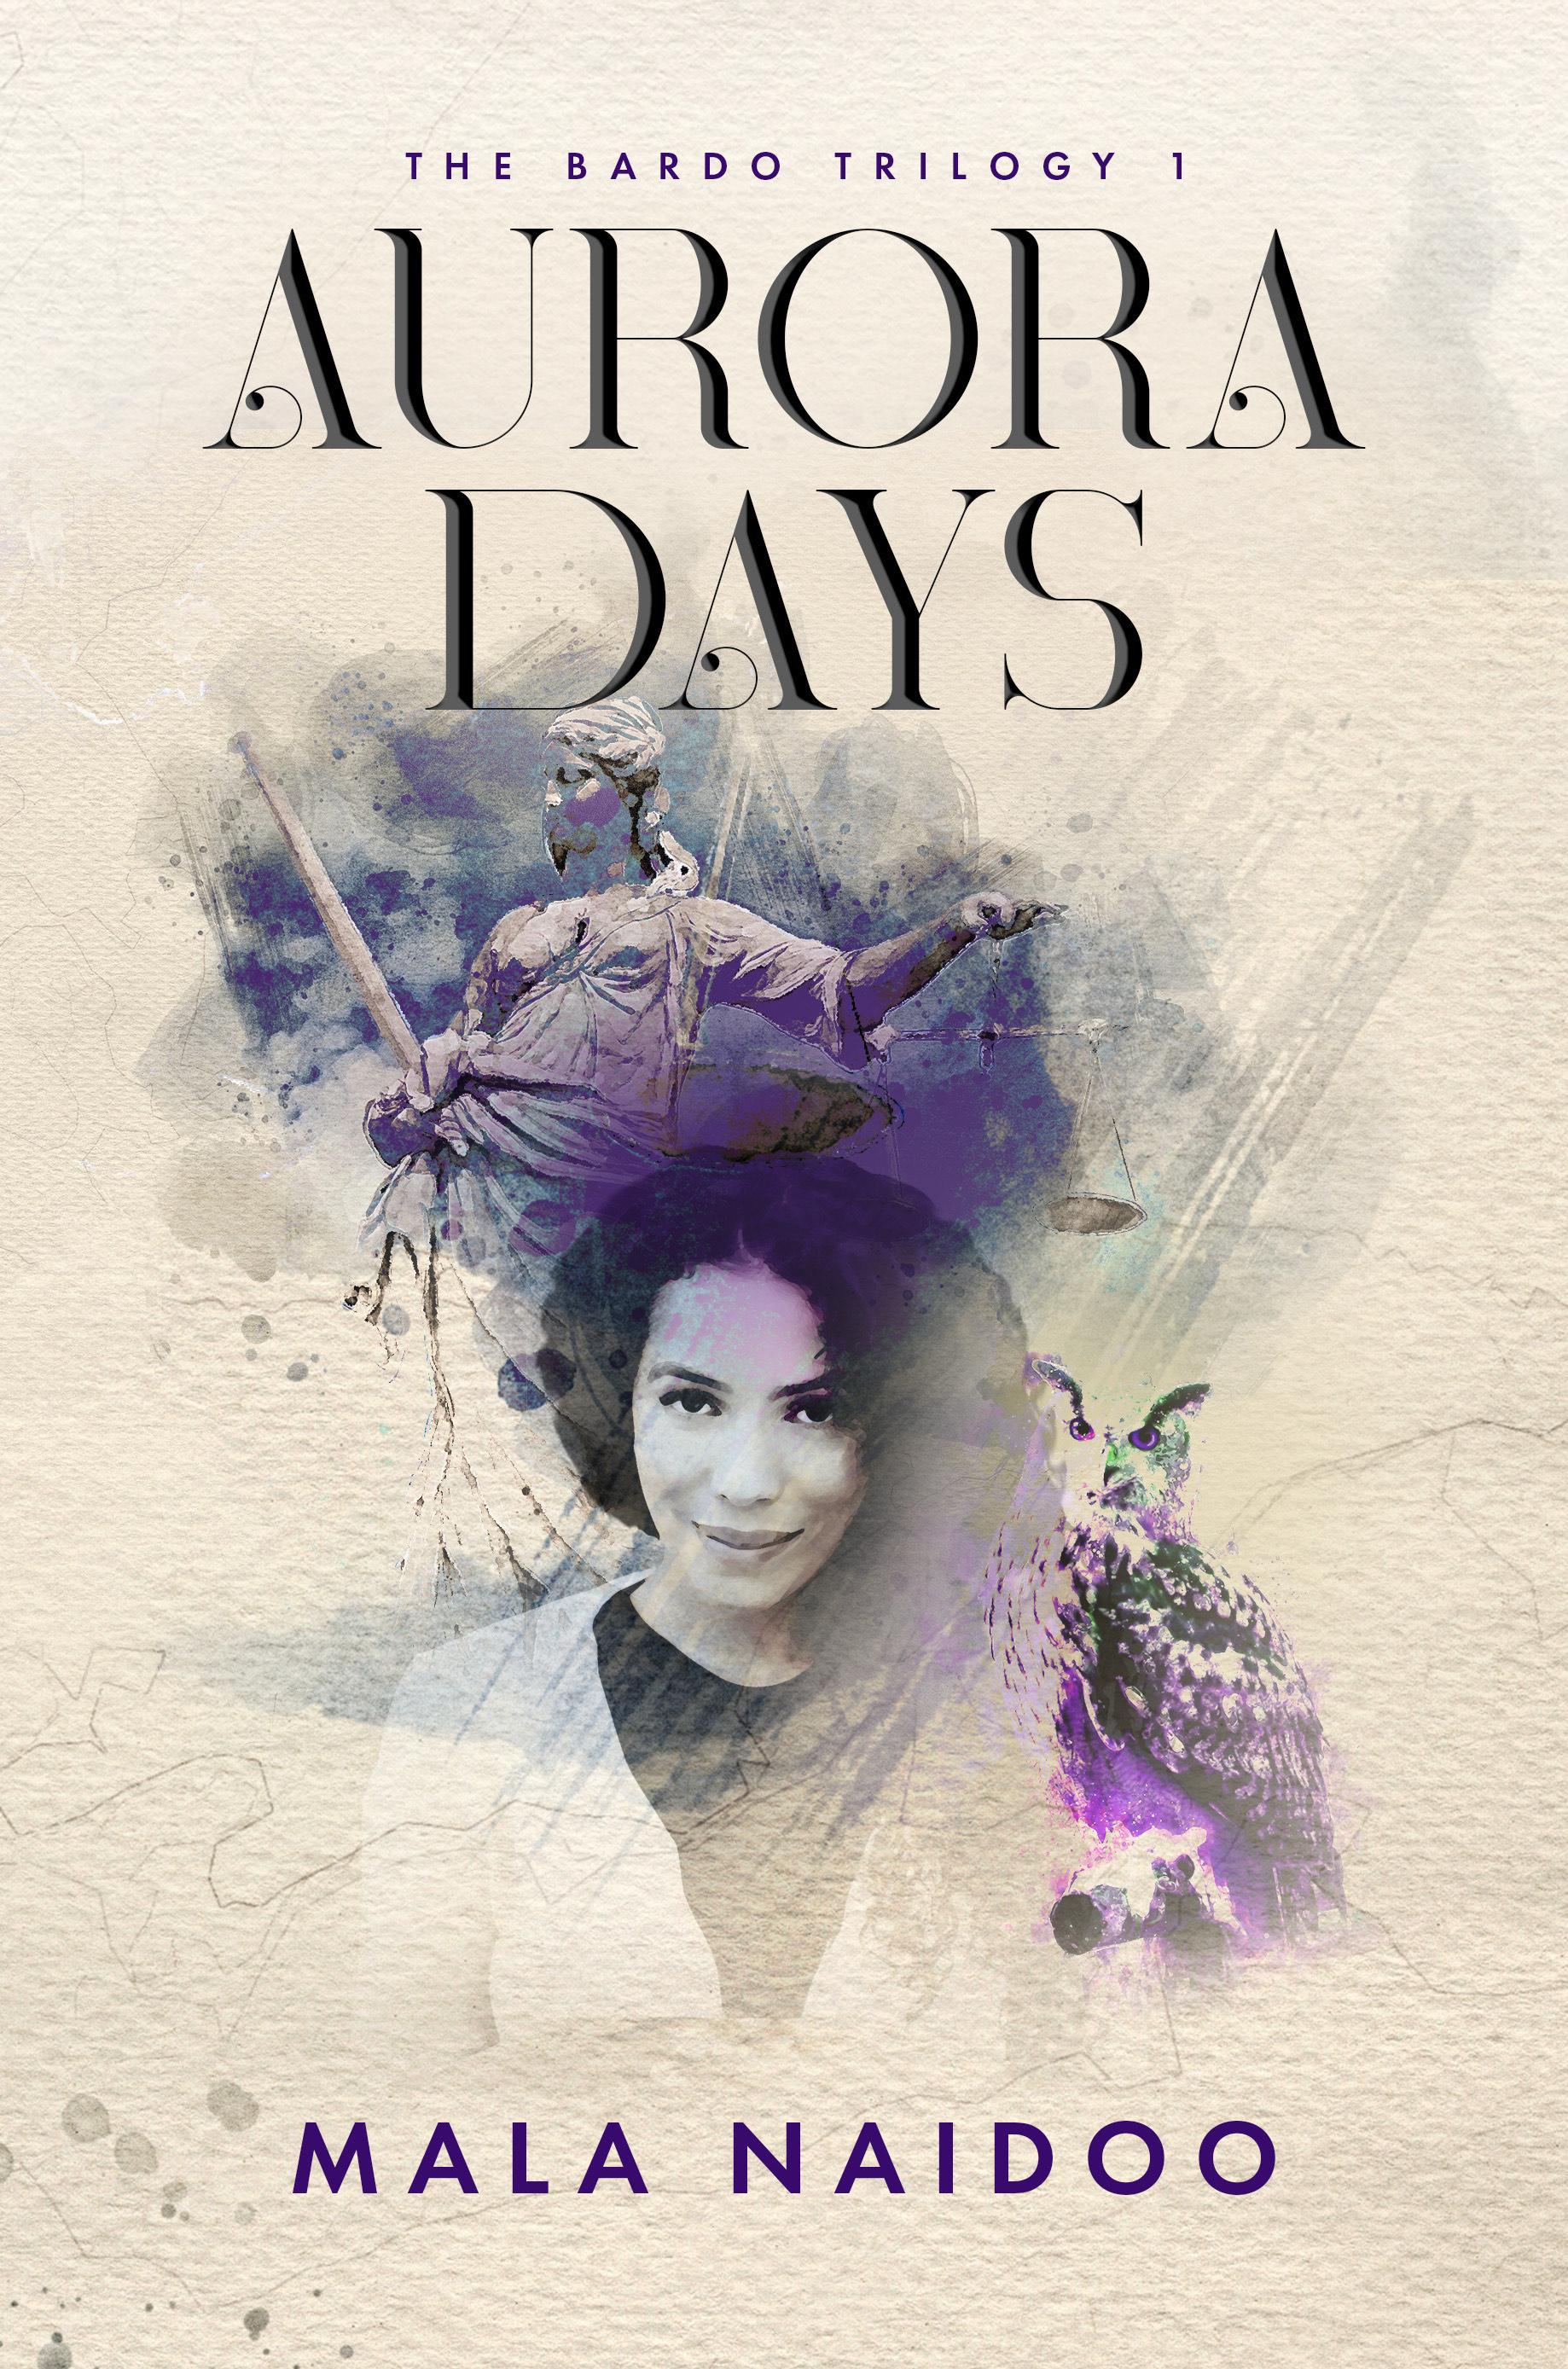 Aurora Days by Mala Naidoo